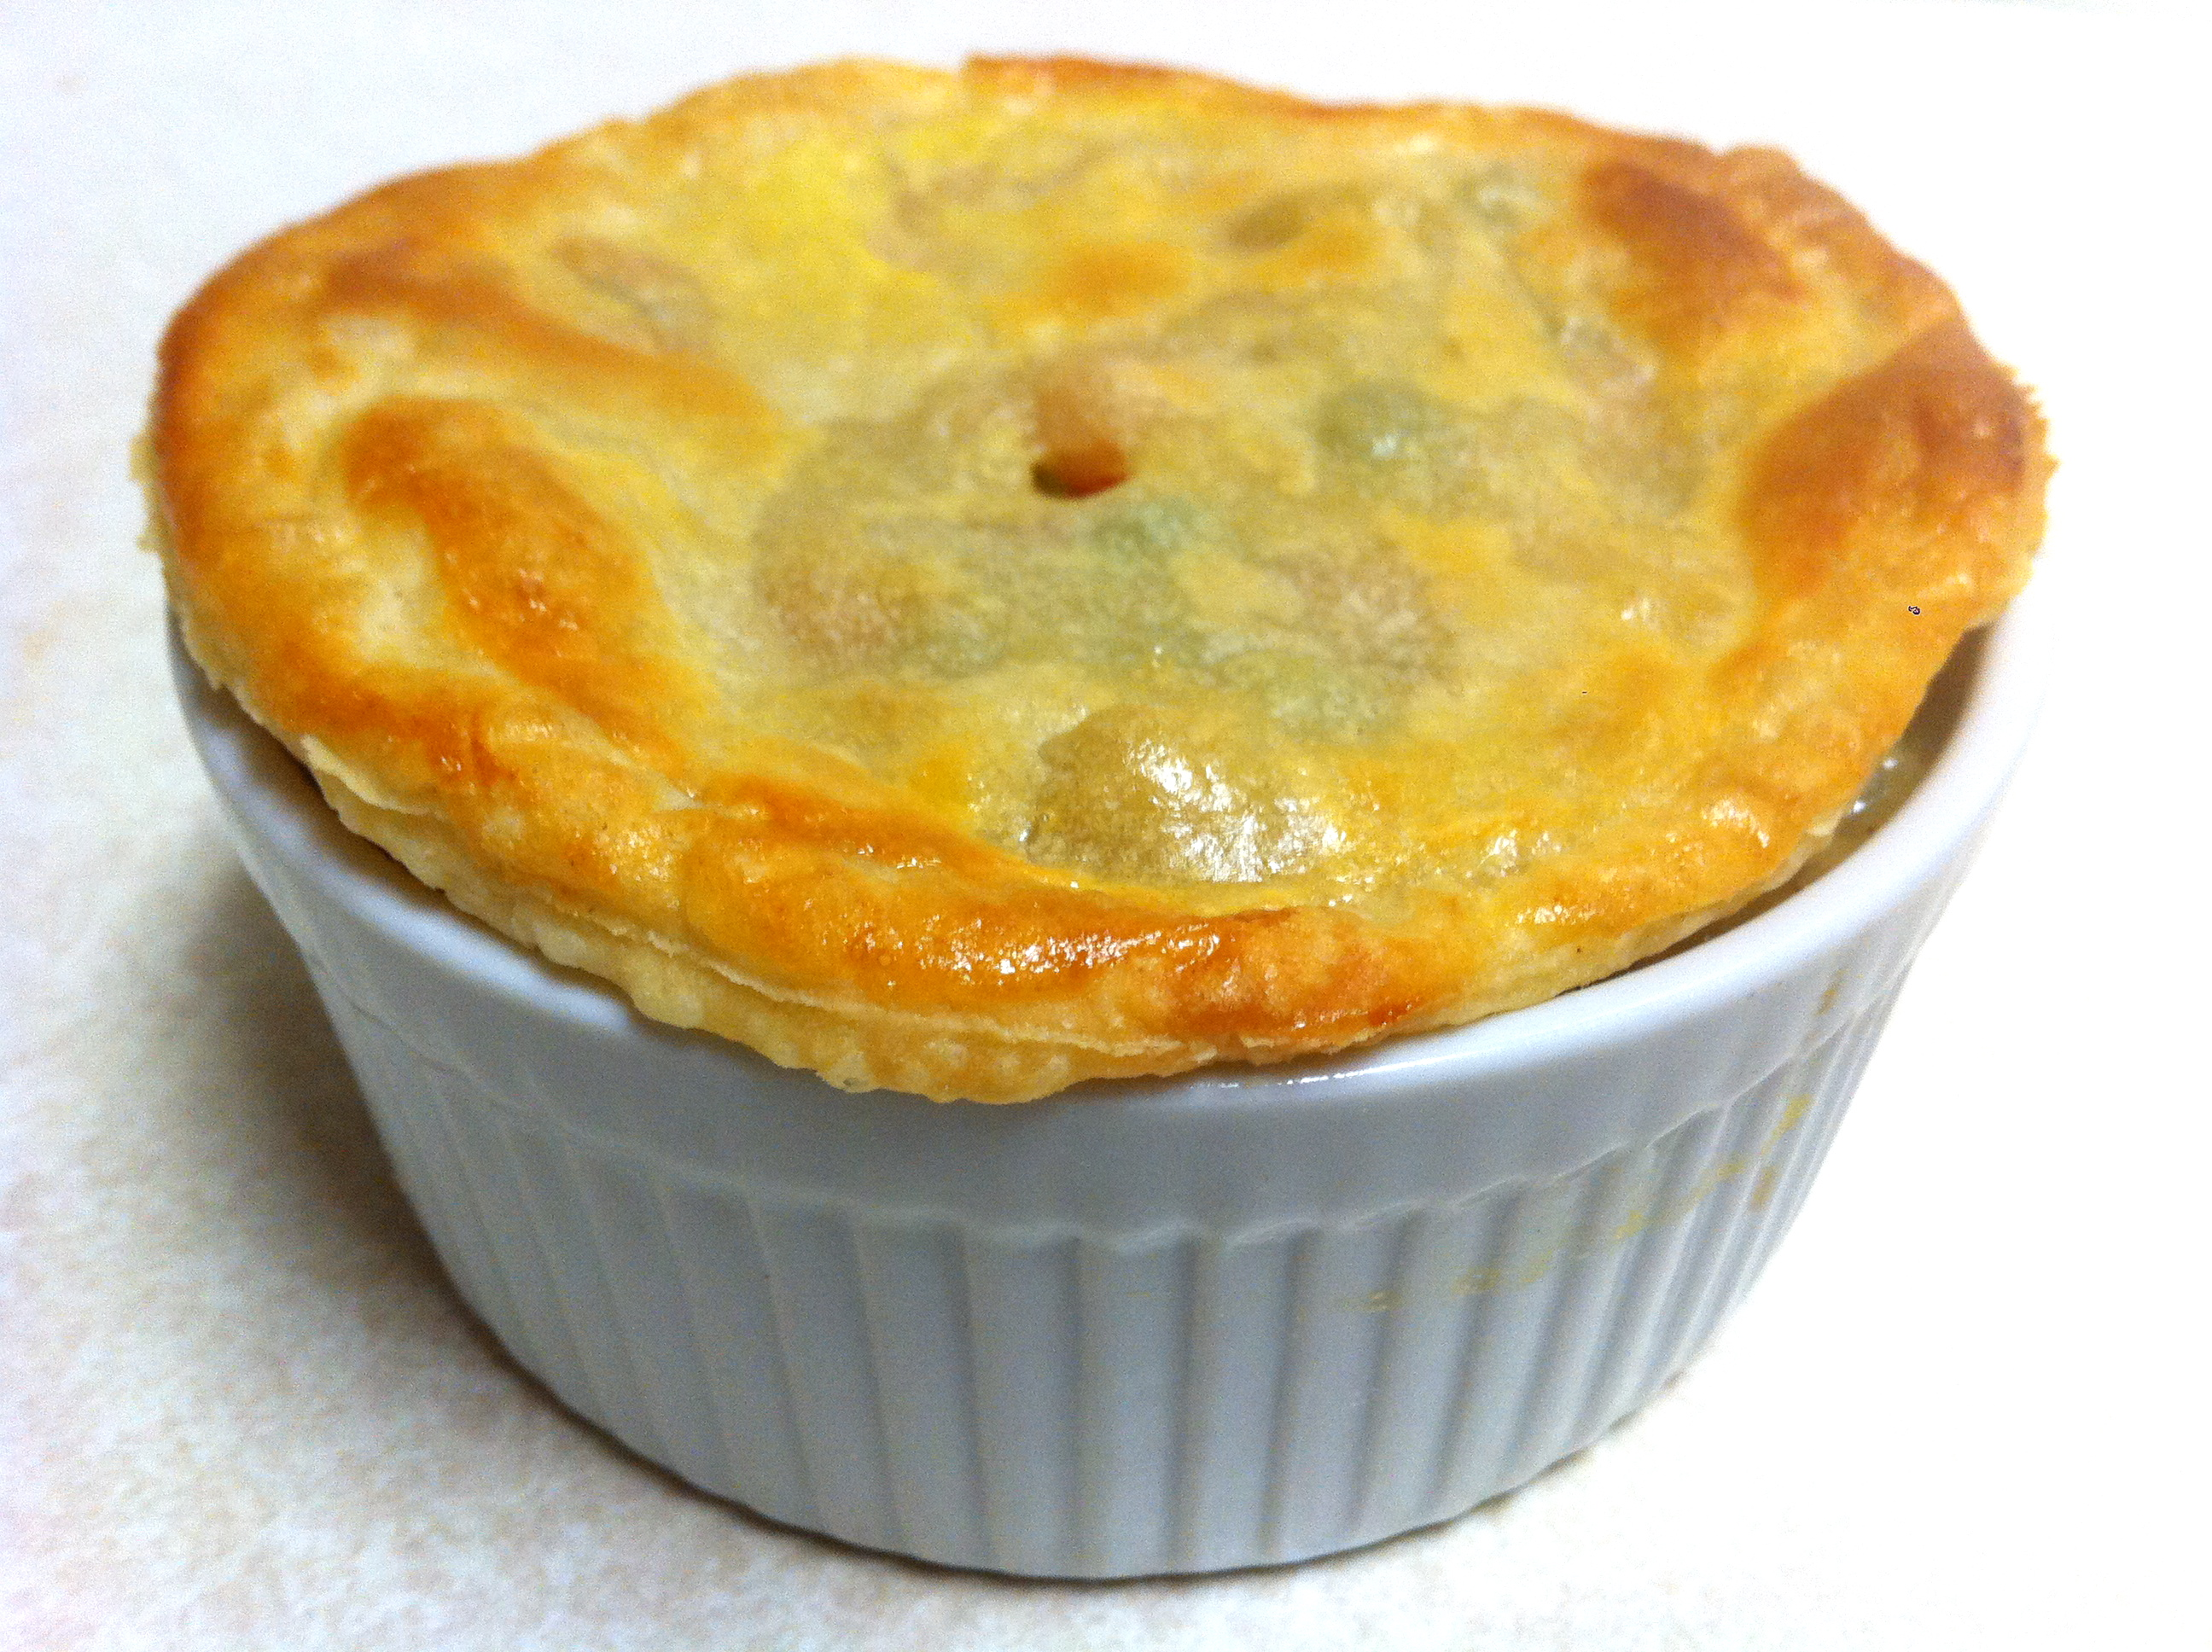 etta says chicken pot pie Lyrics to 'whole lotta shakin' goin' on' by jerry lee lewis.